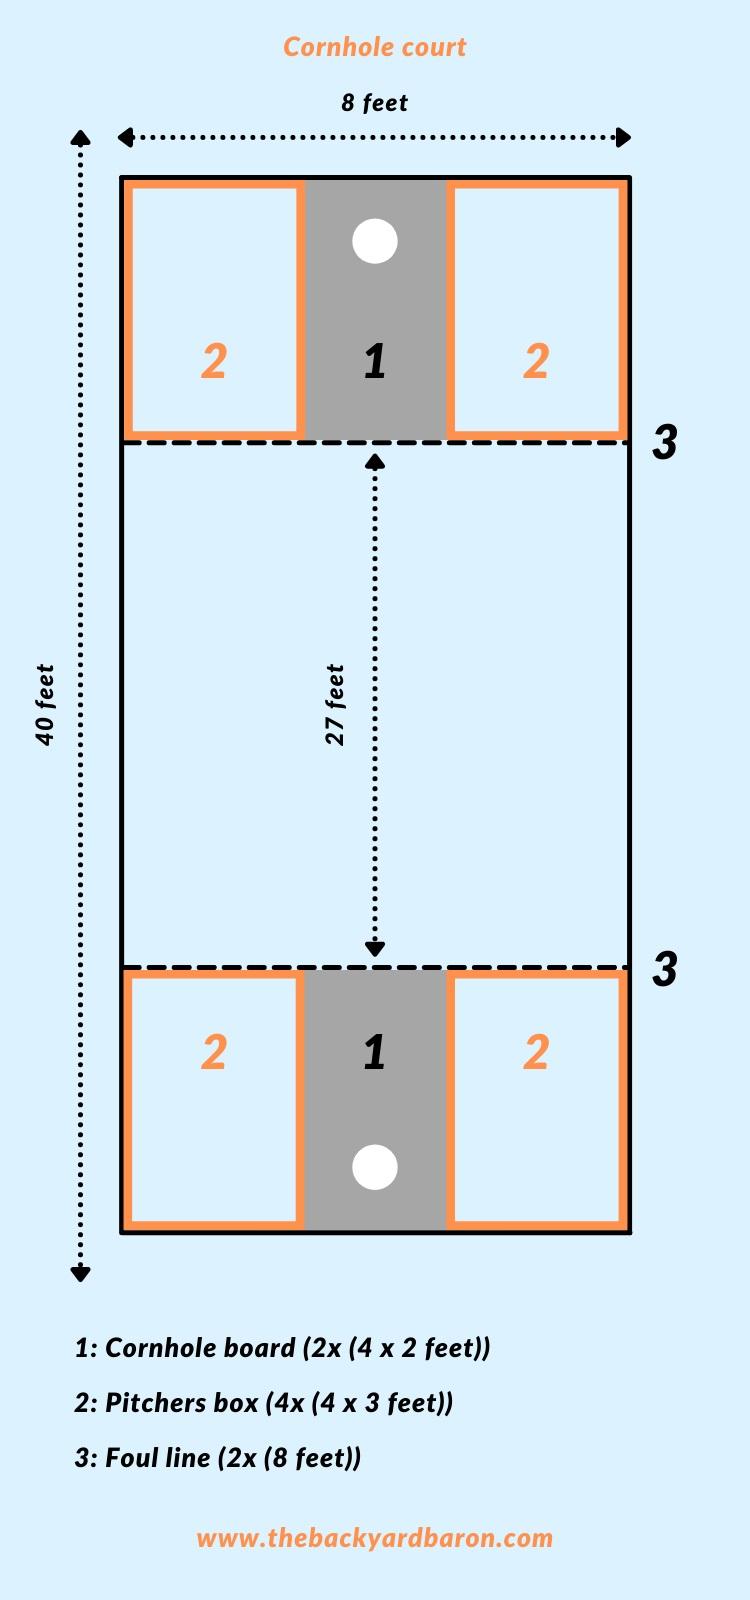 Diagram of a cornhole court